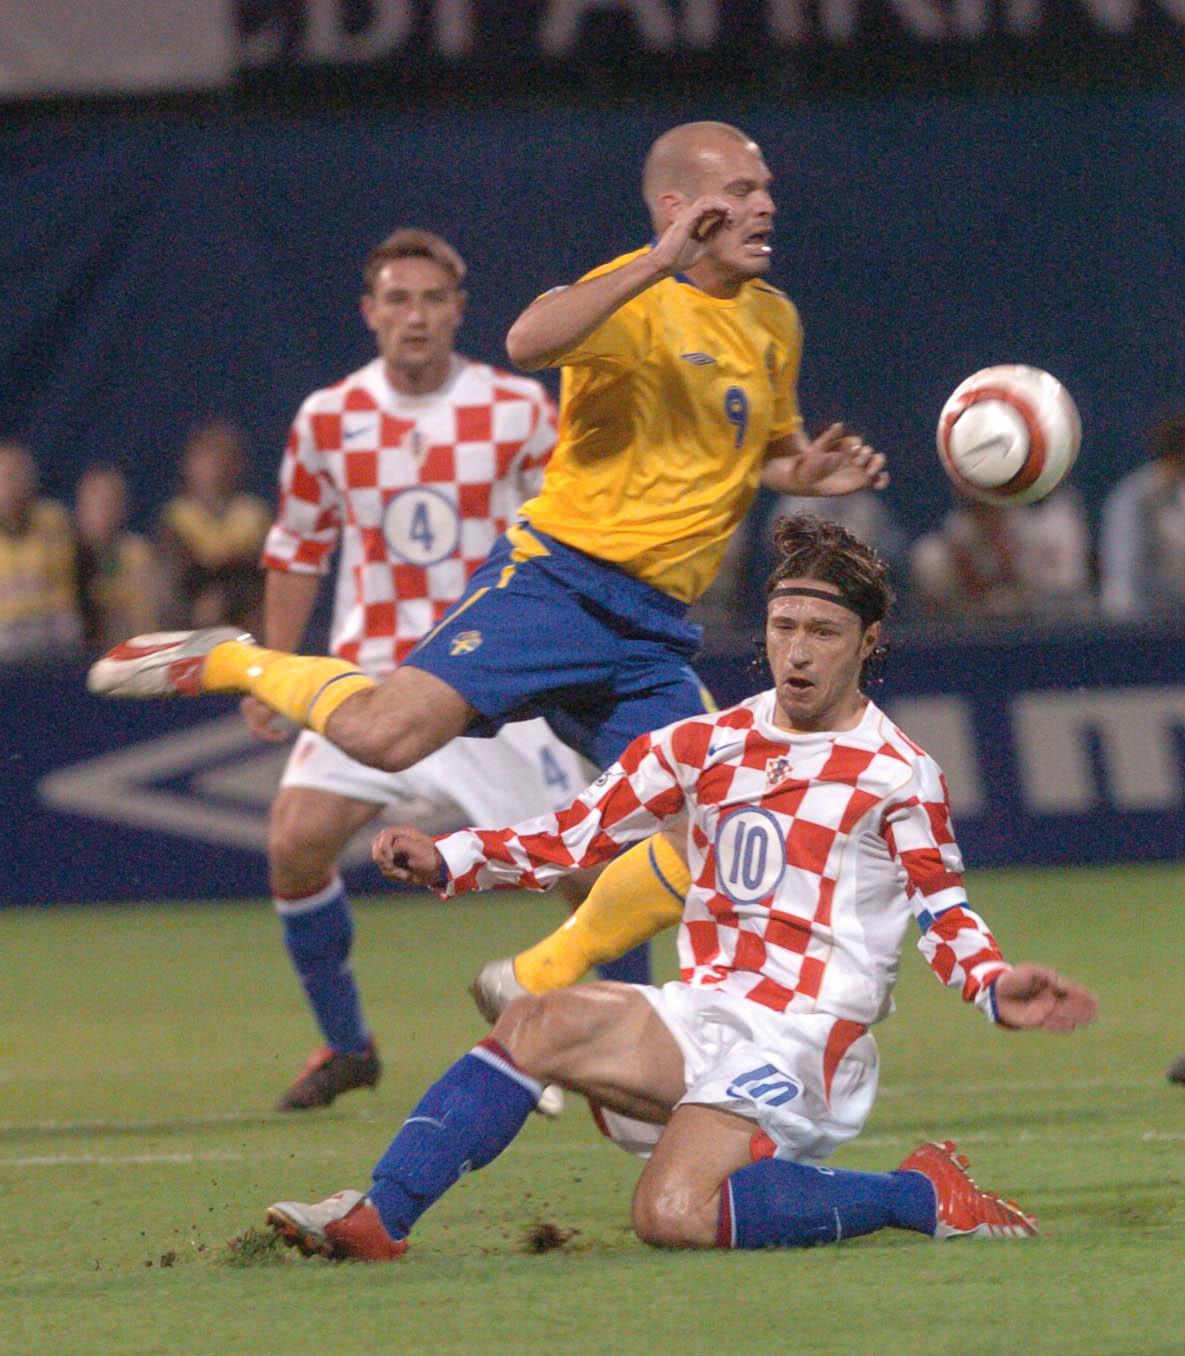 08.10.2005. Hrvatska - Svedska 1 - 0   Niko Kovac , Ljungberg   snimio N Dugi